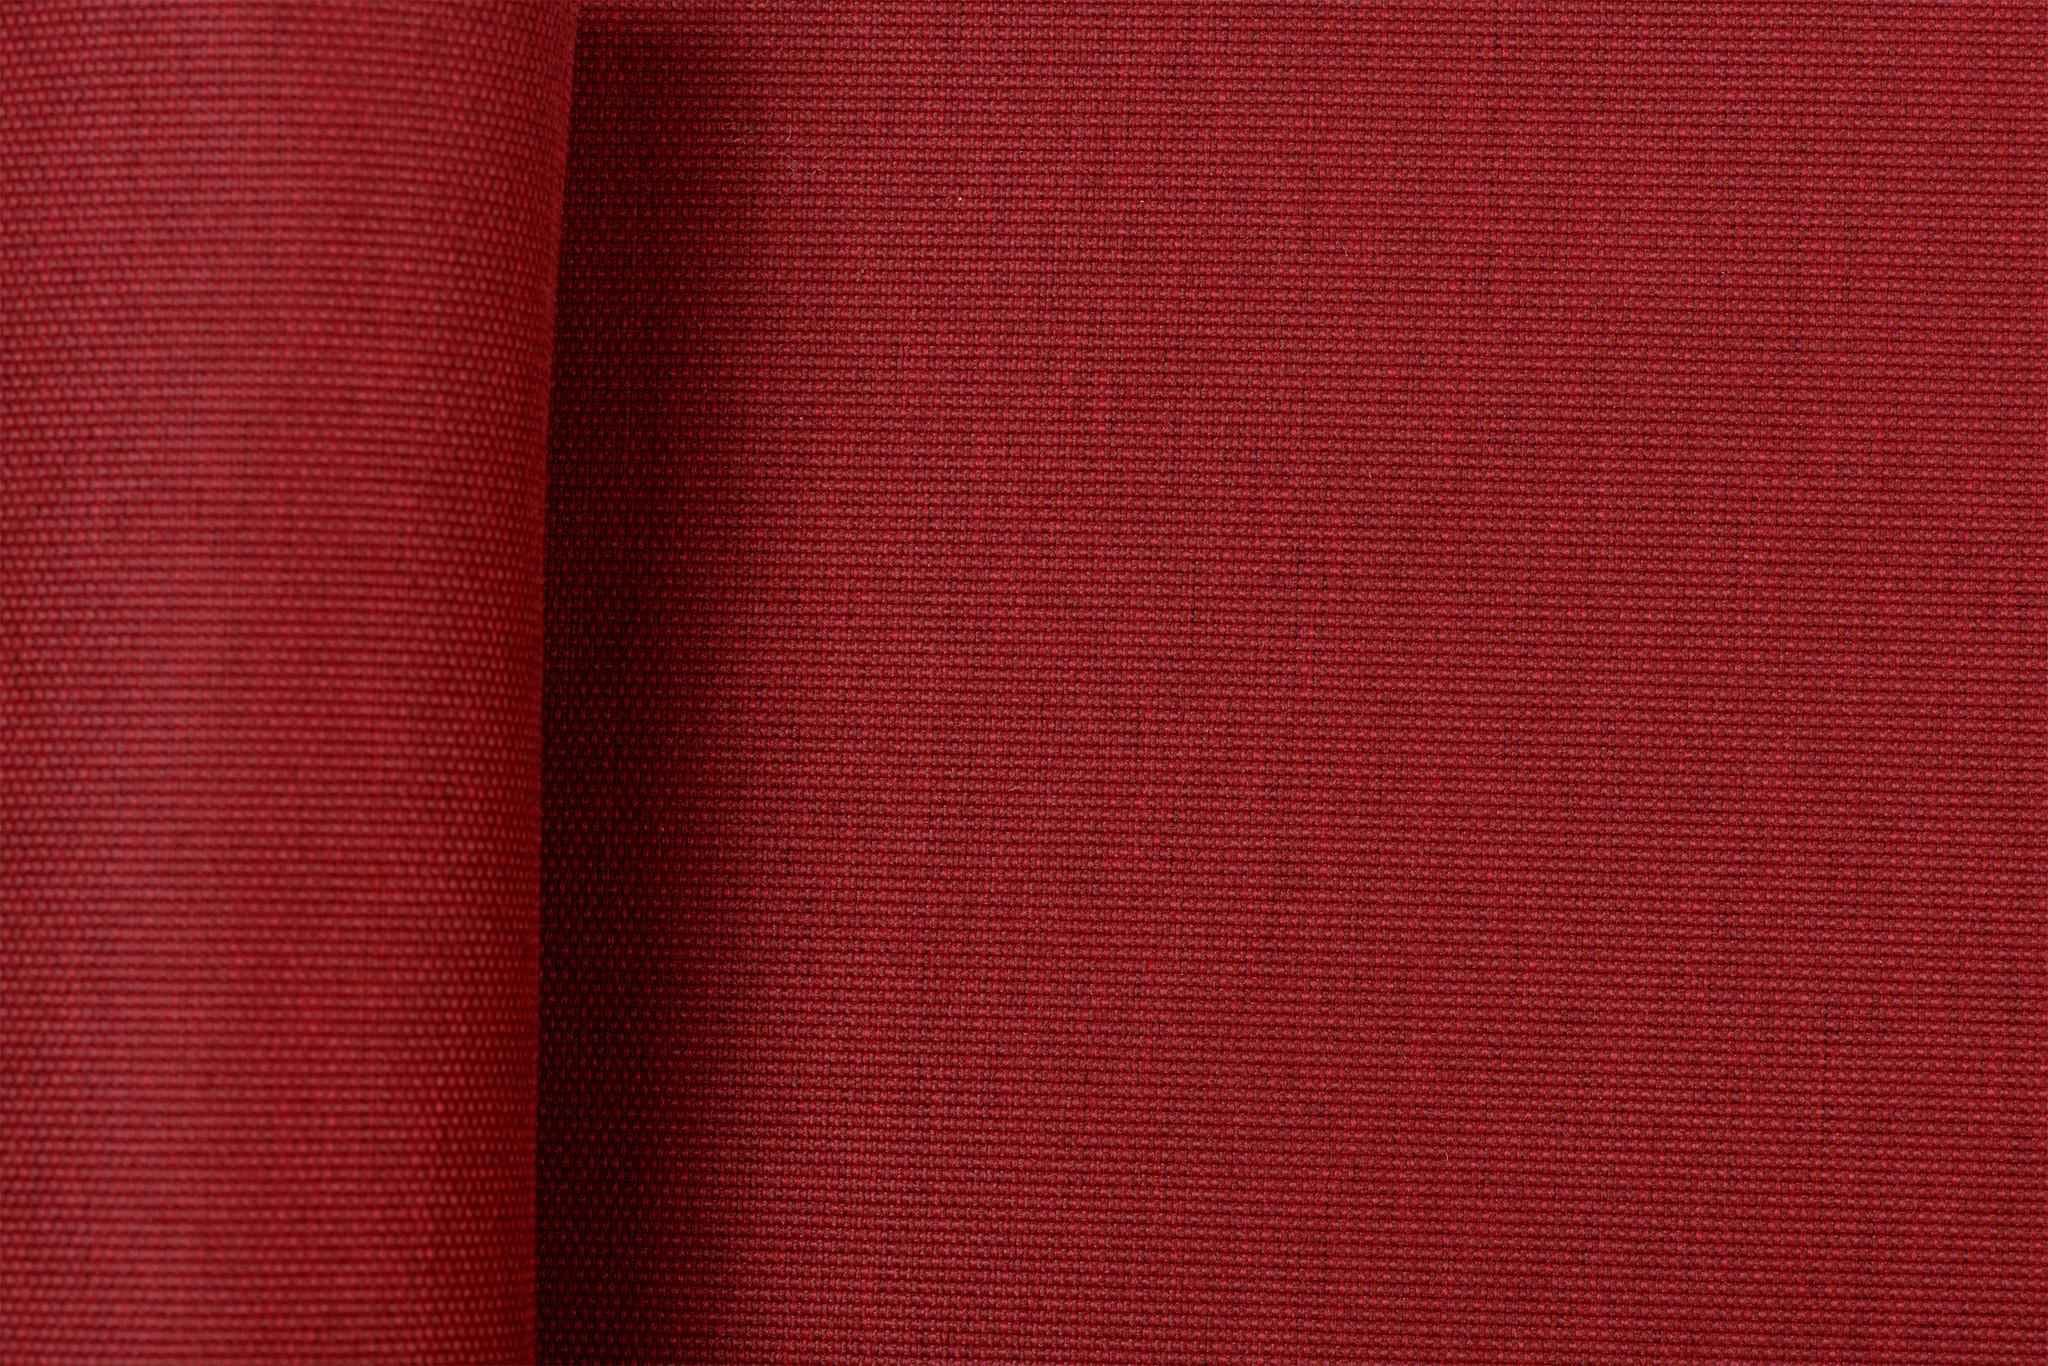 Outdoor Stof Curaçao Ruby Red Melange